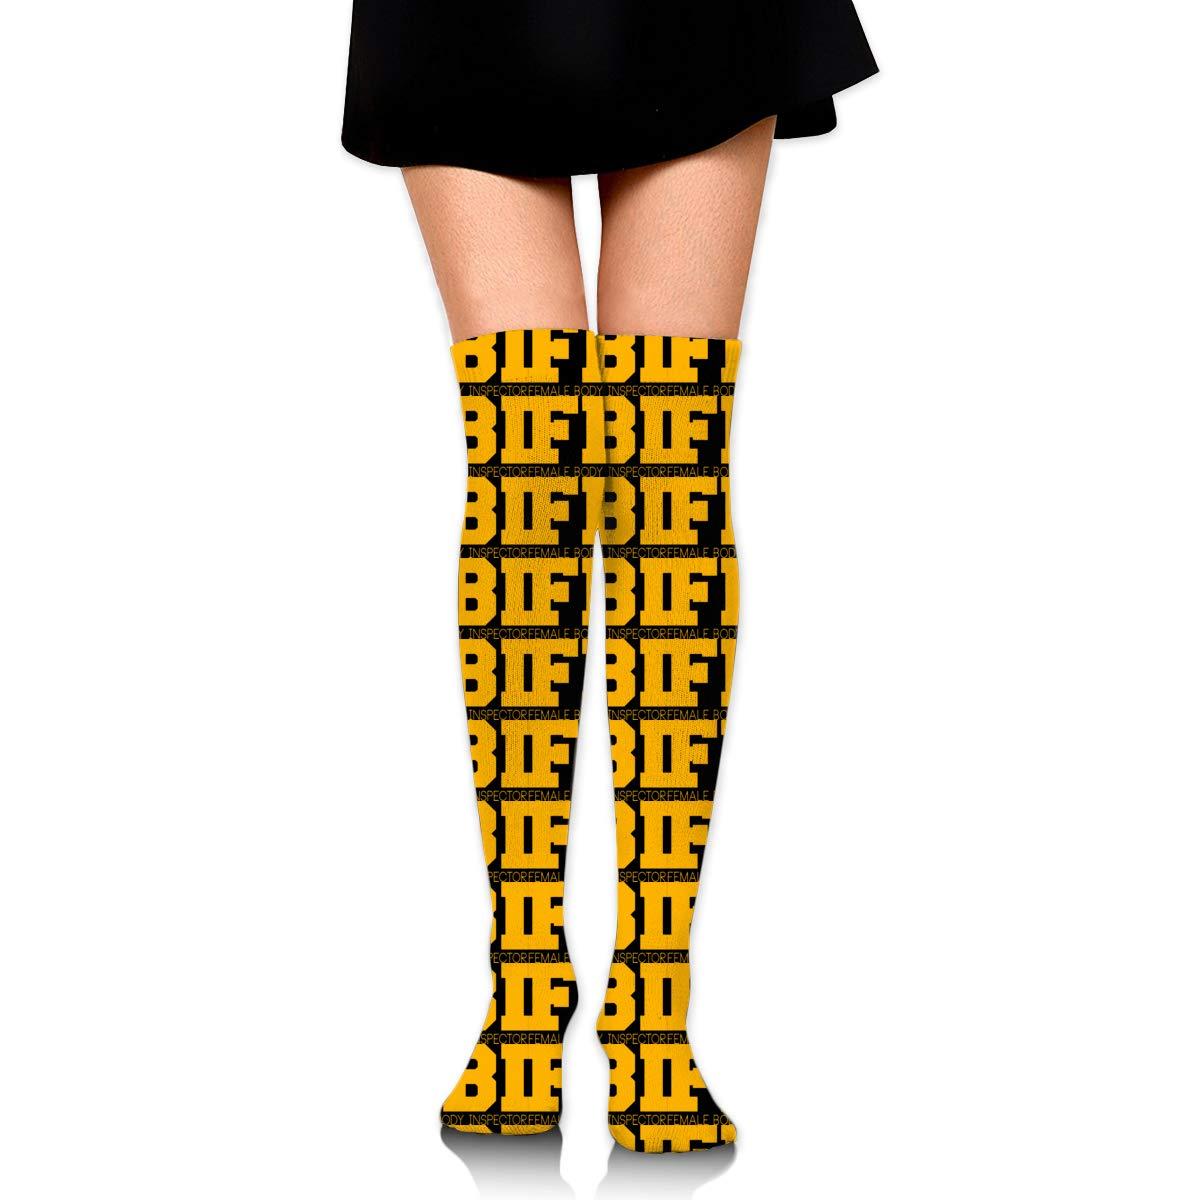 Amazon.com FBI Female Body Inspector Womens Over Knee Thigh